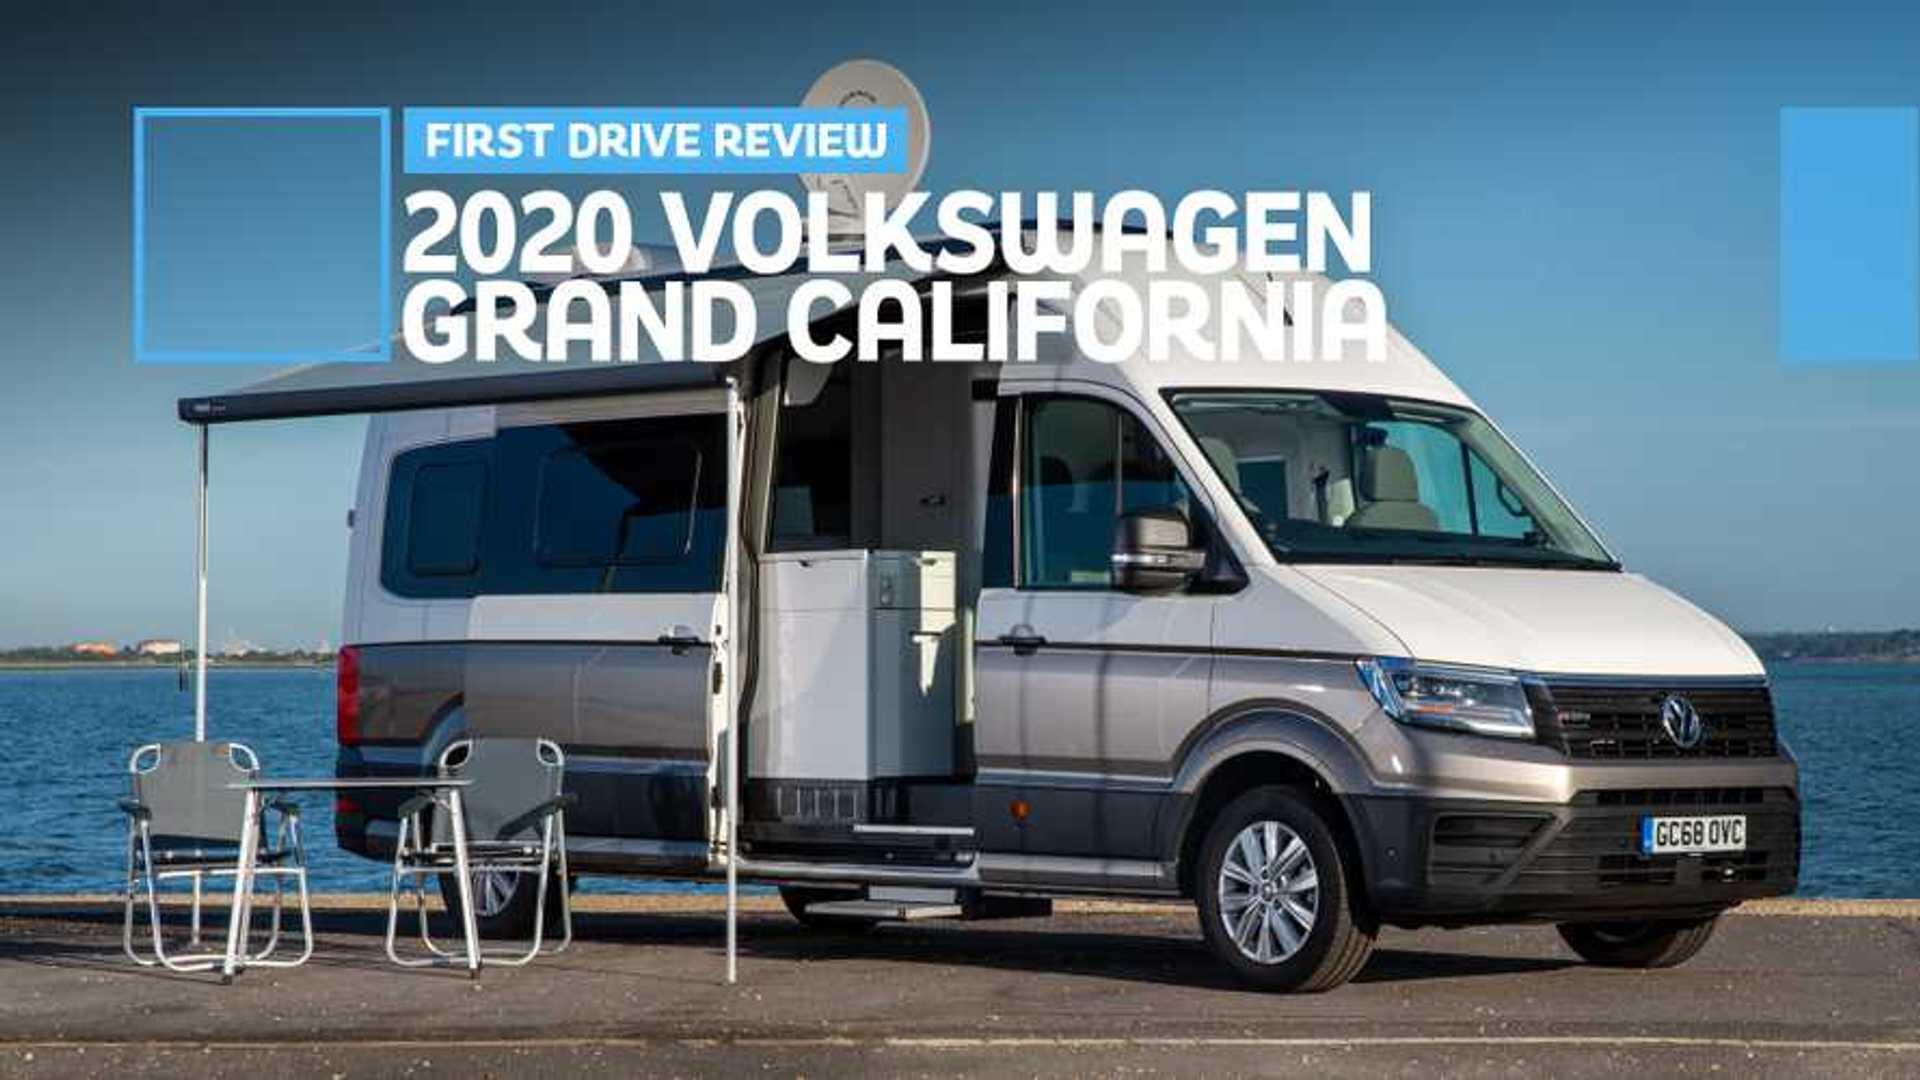 2020 Volkswagen Grand California First Drive: Grand Ambition